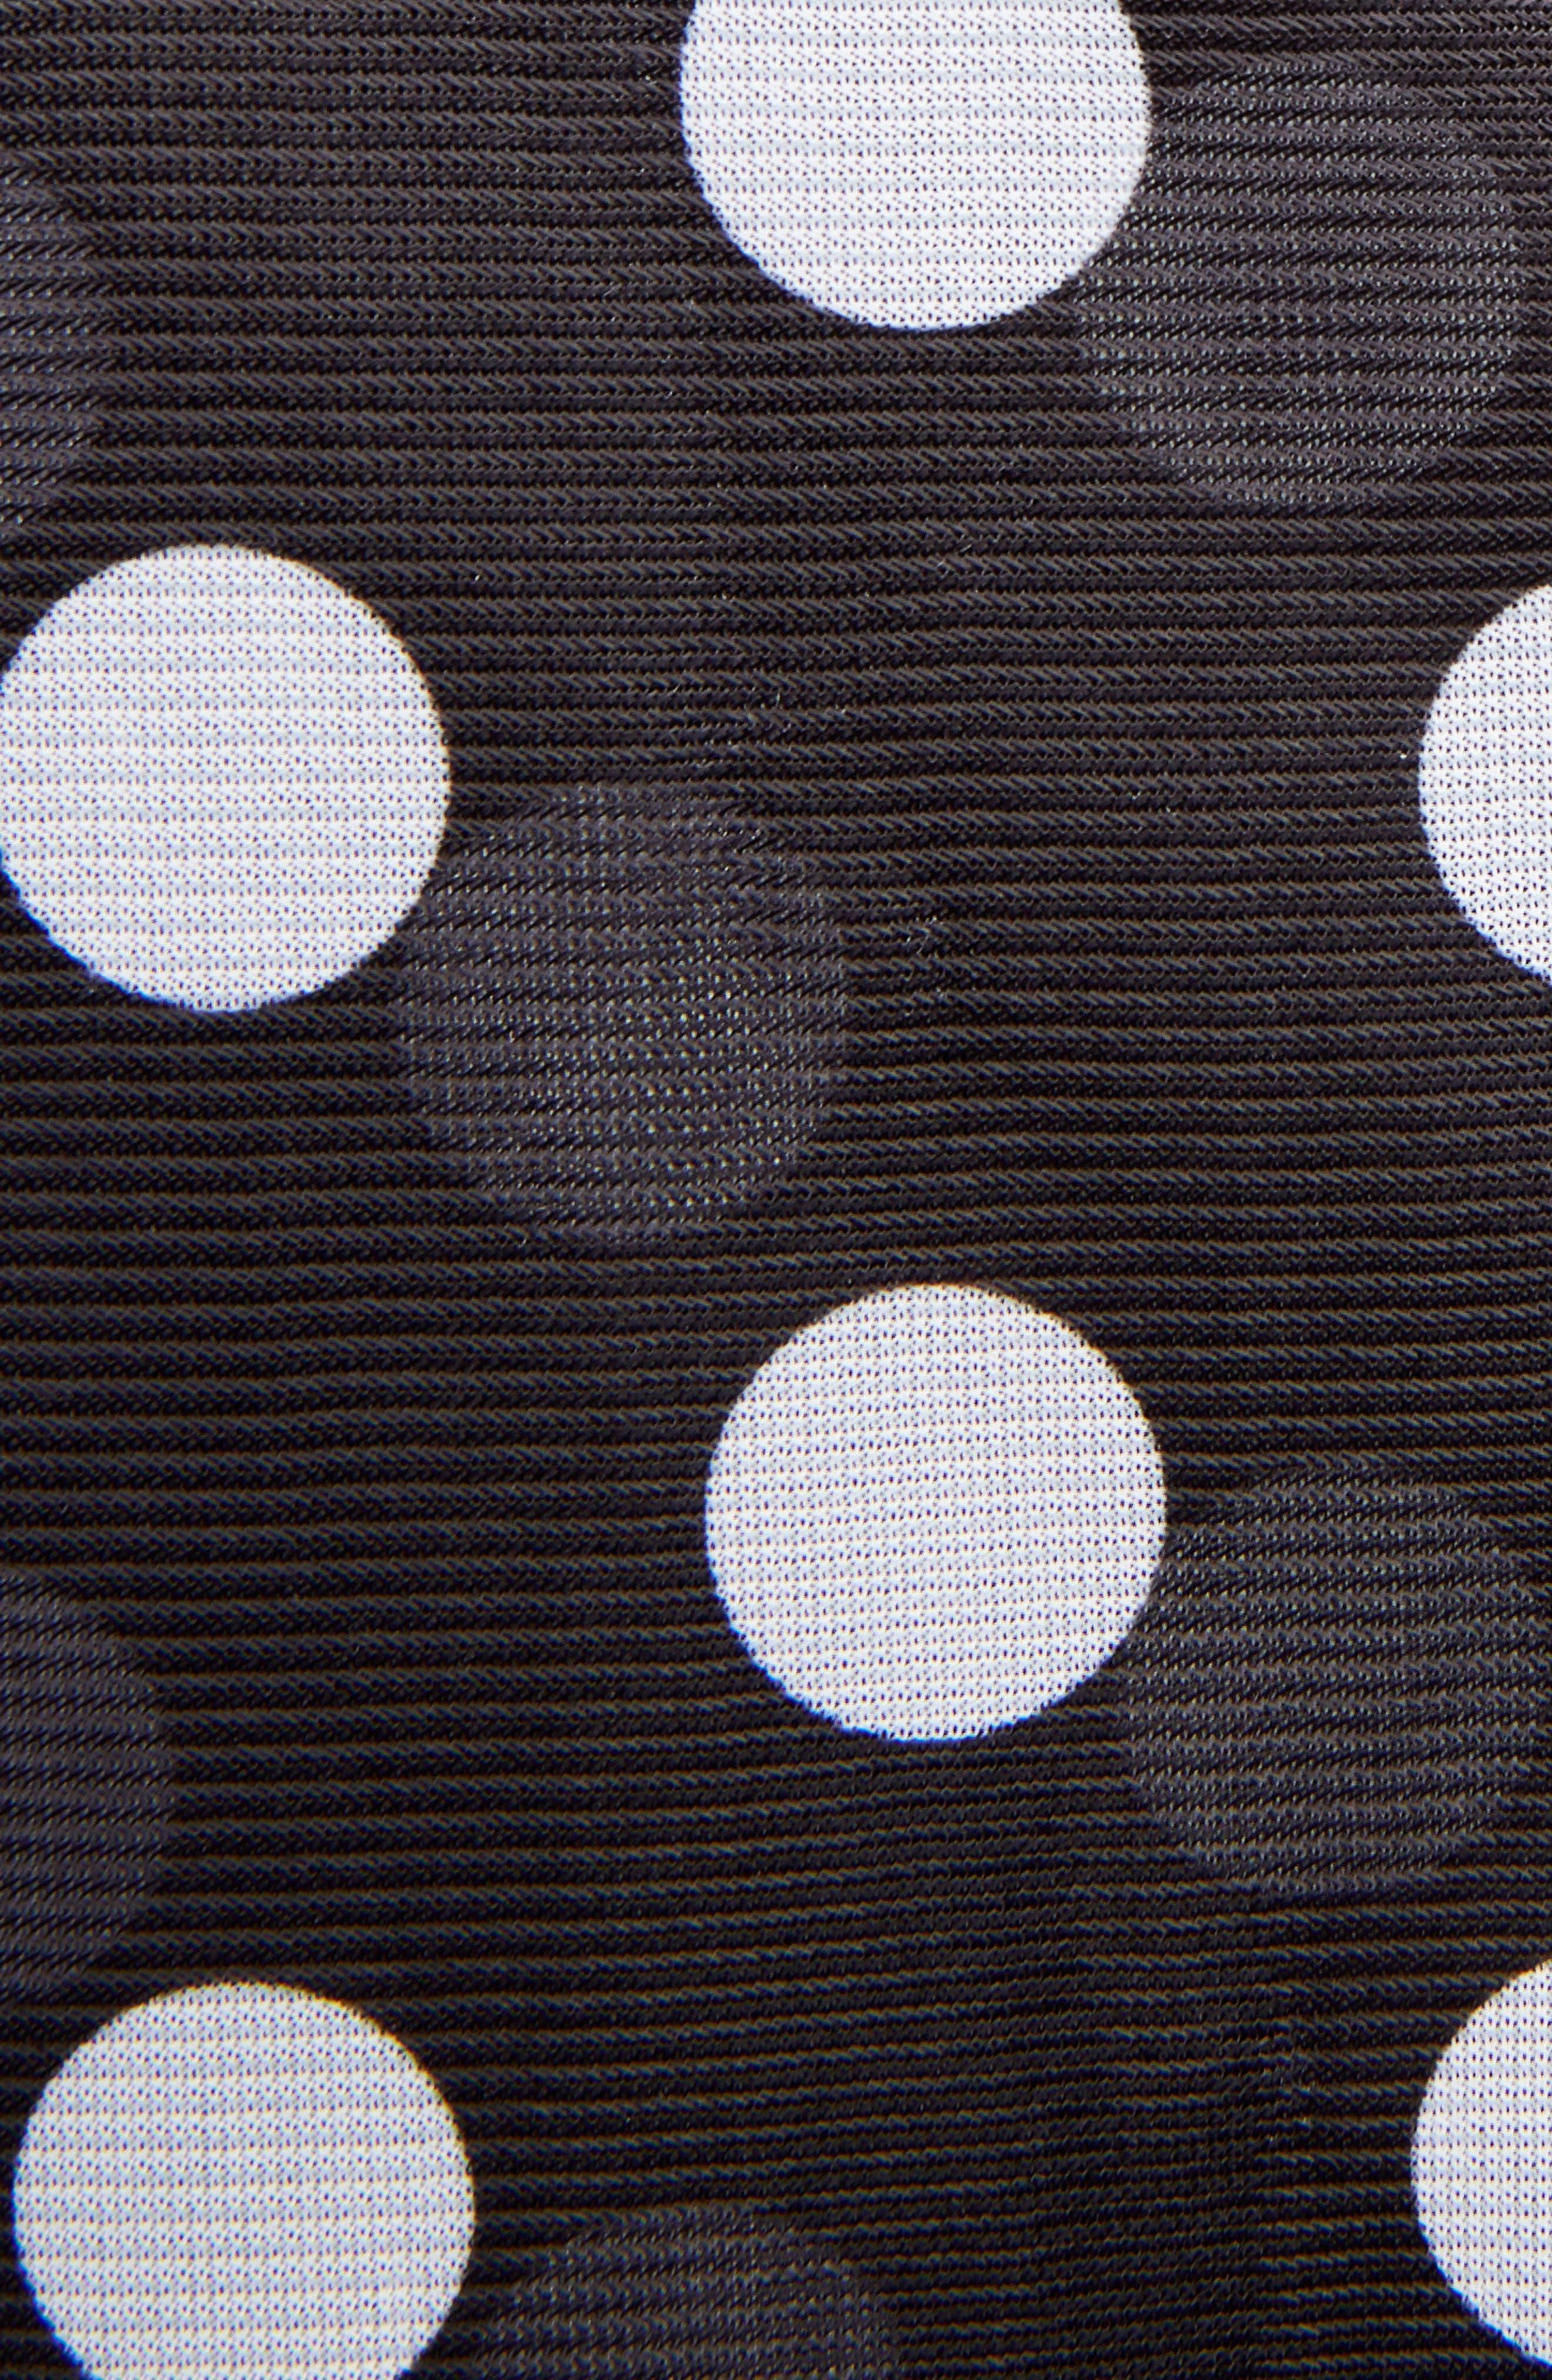 Polka Dot Minidress with Ditsy Floral Blouse,                             Alternate thumbnail 5, color,                             001